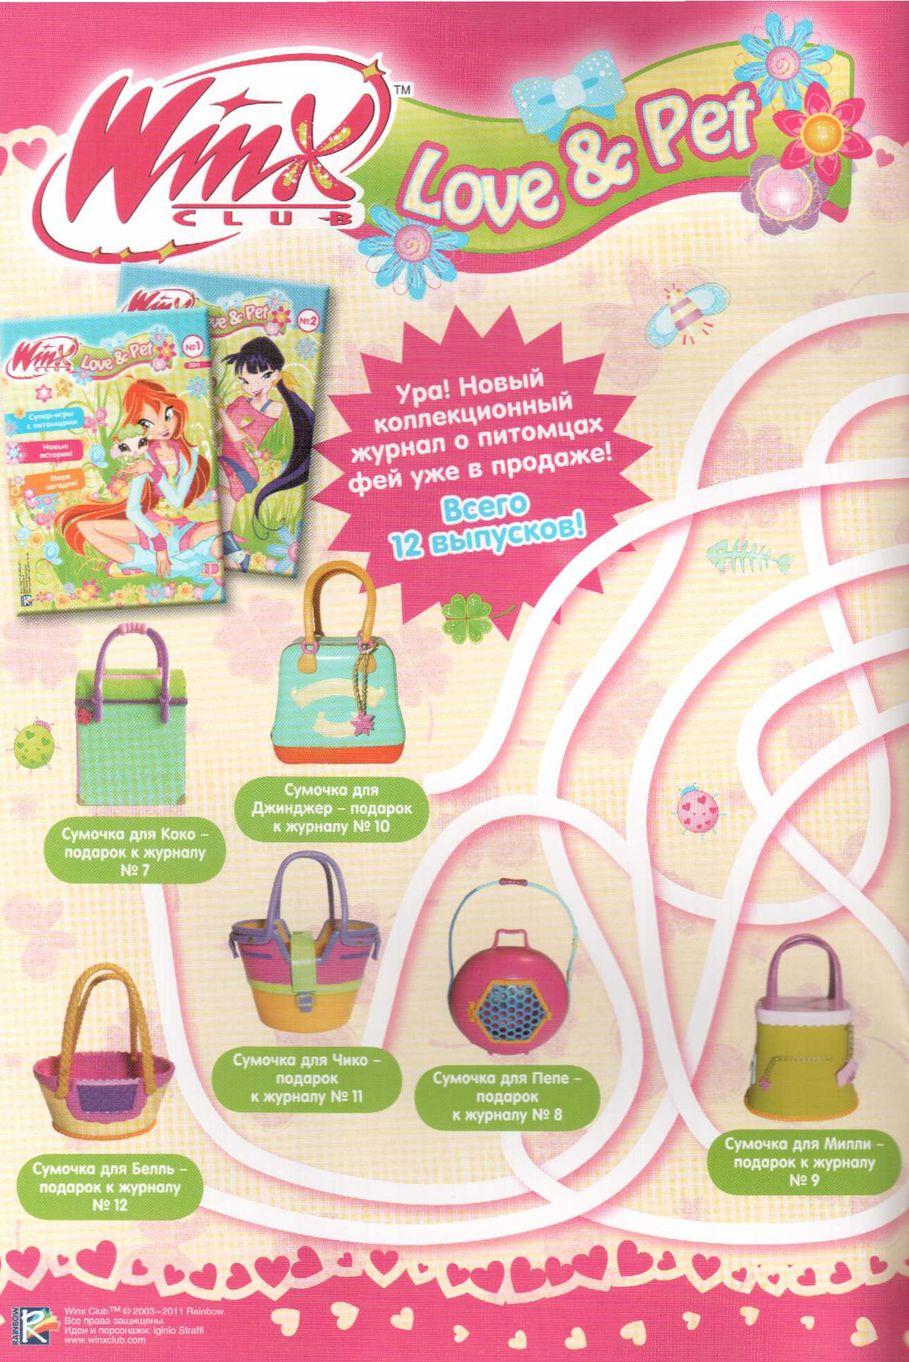 Комикс Винкс Winx - Любовь и ревность (Журнал Винкс №7 2011) - стр. 2